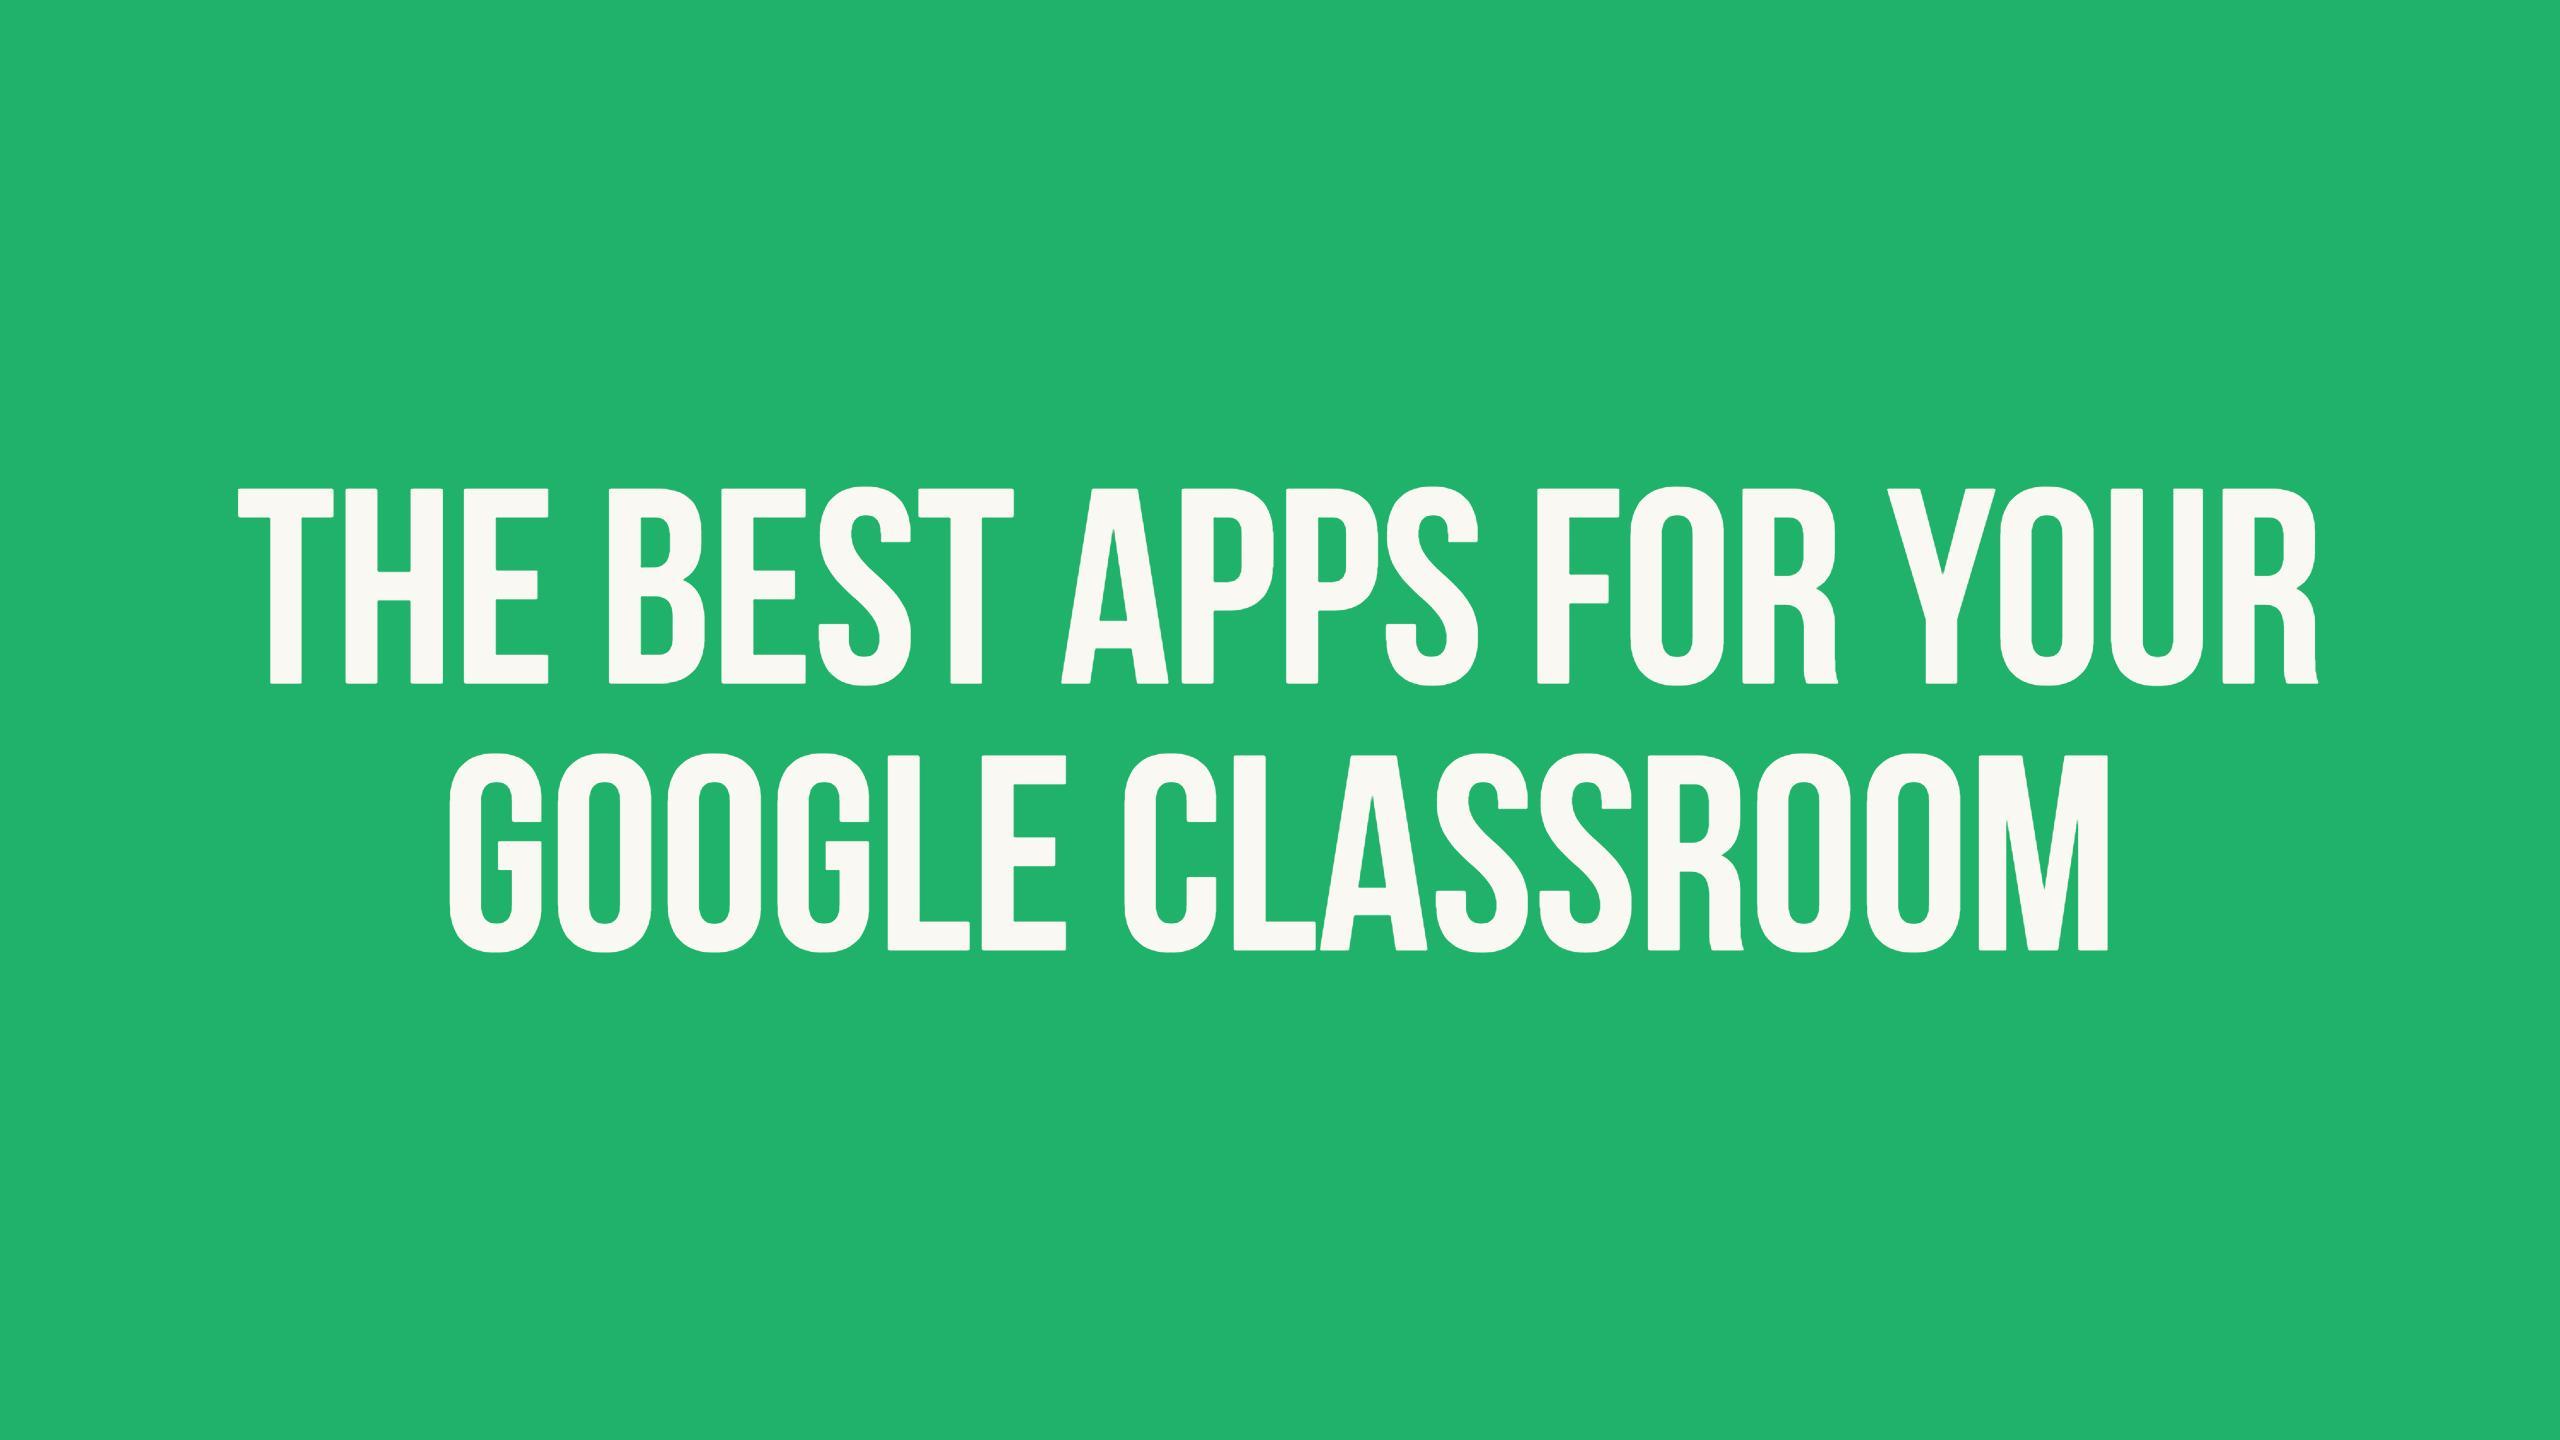 Google Classroom Guide